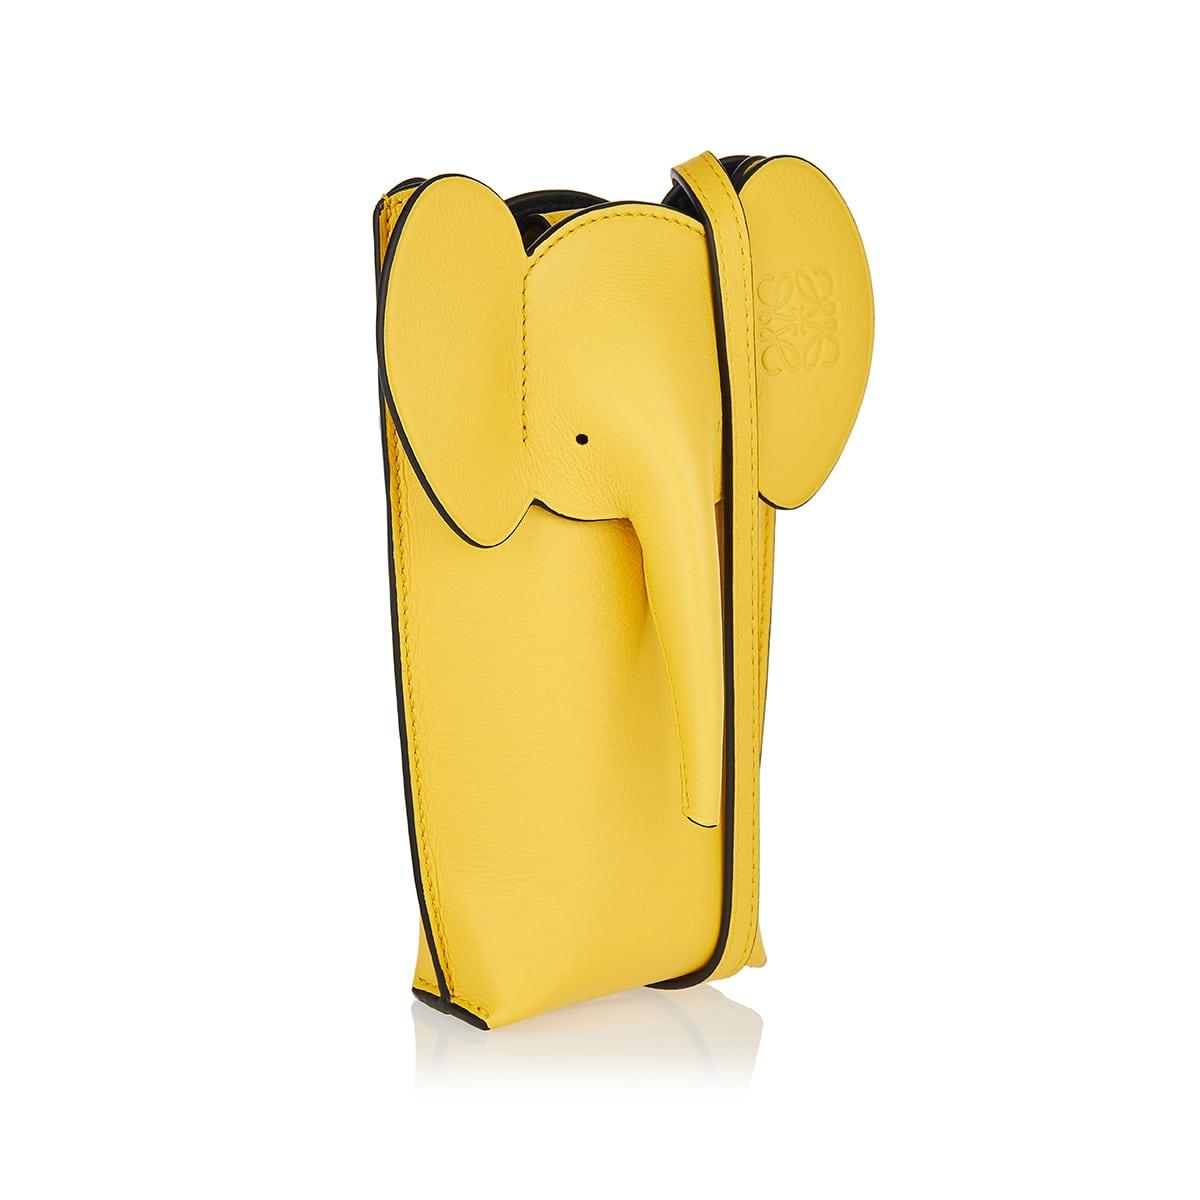 Elephant Pocket leather pouch